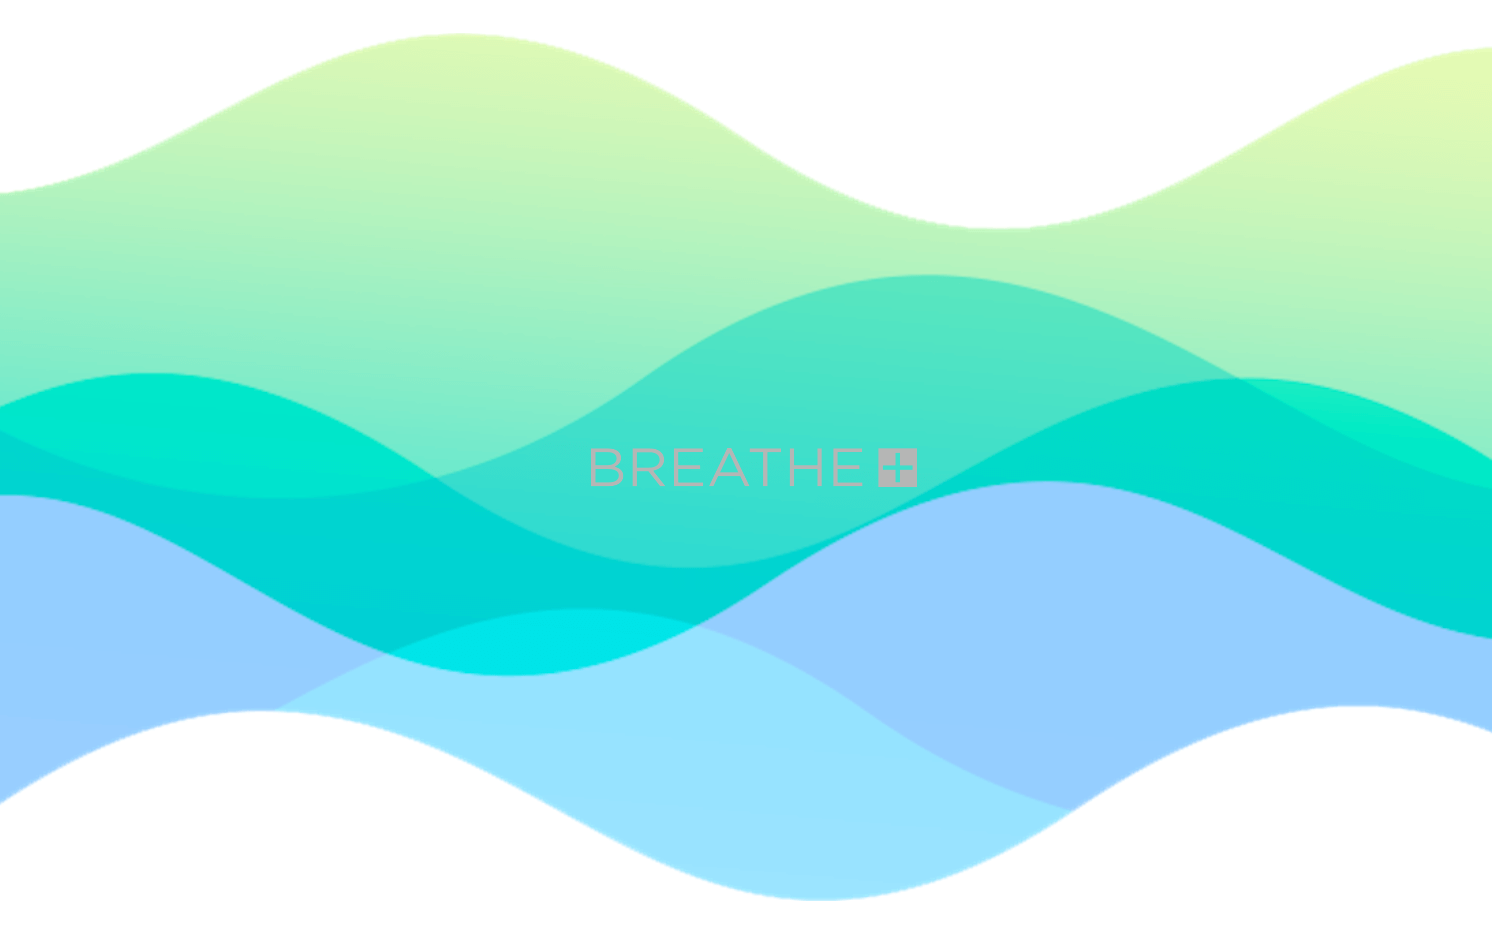 Приложение Breathe для Apple Watch доступно для iOS (почти)